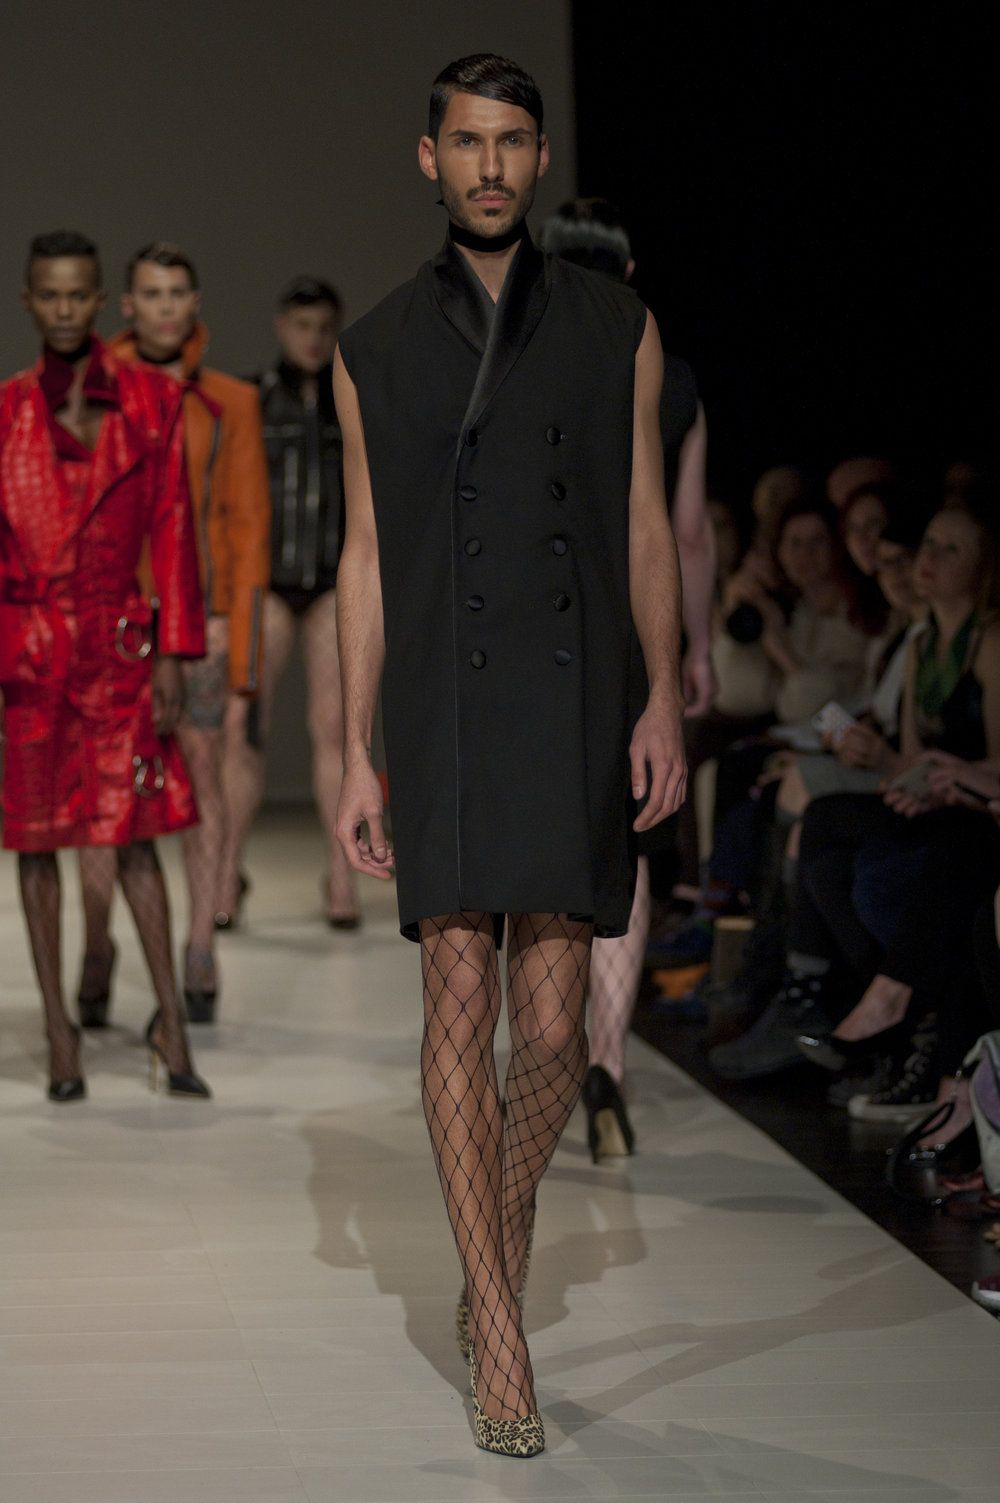 Pin by kay english on womenus fashion for men pinterest men